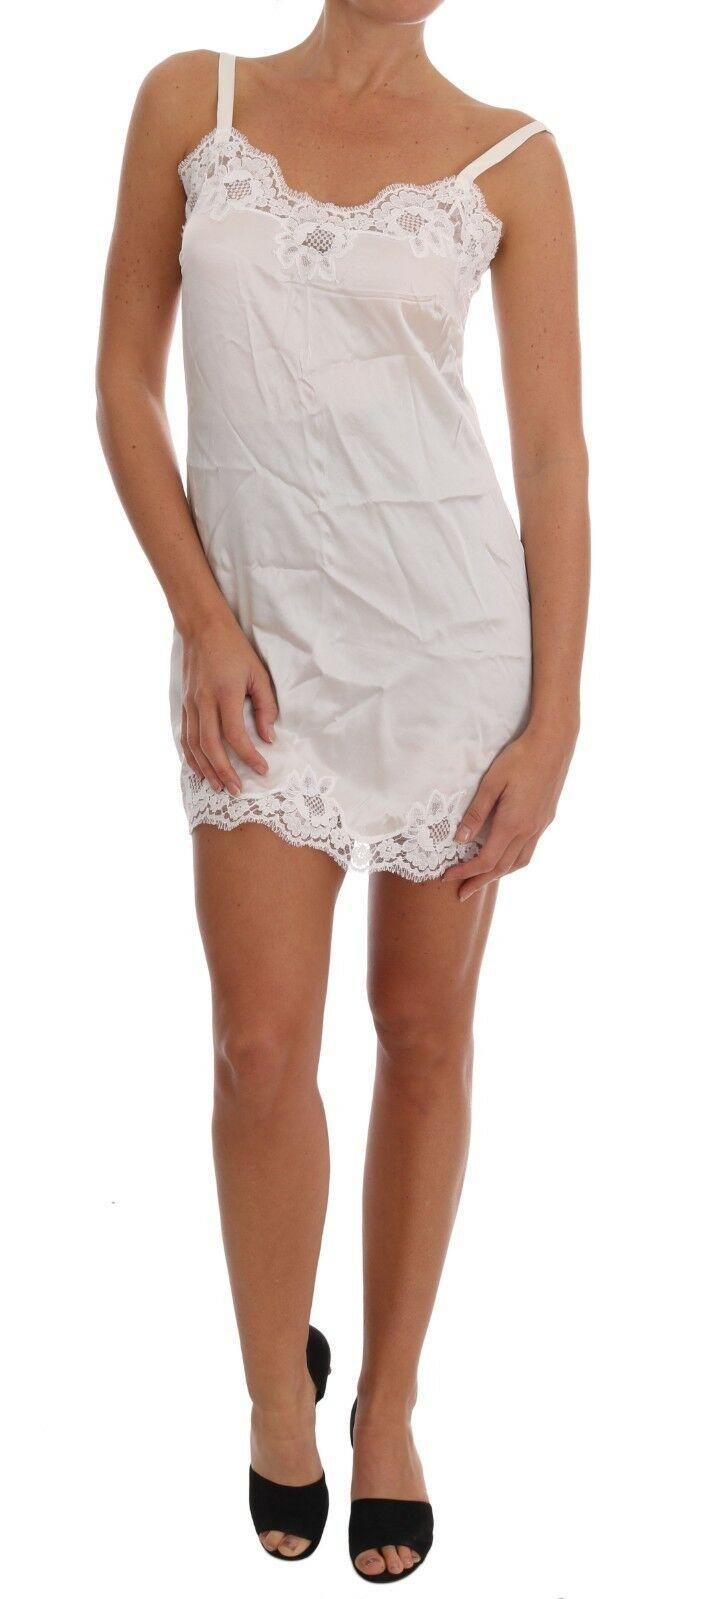 Dolce & Gabbana Women's Silk Lace Lingerie Chemise Dress White BIK092 - IT1   XS